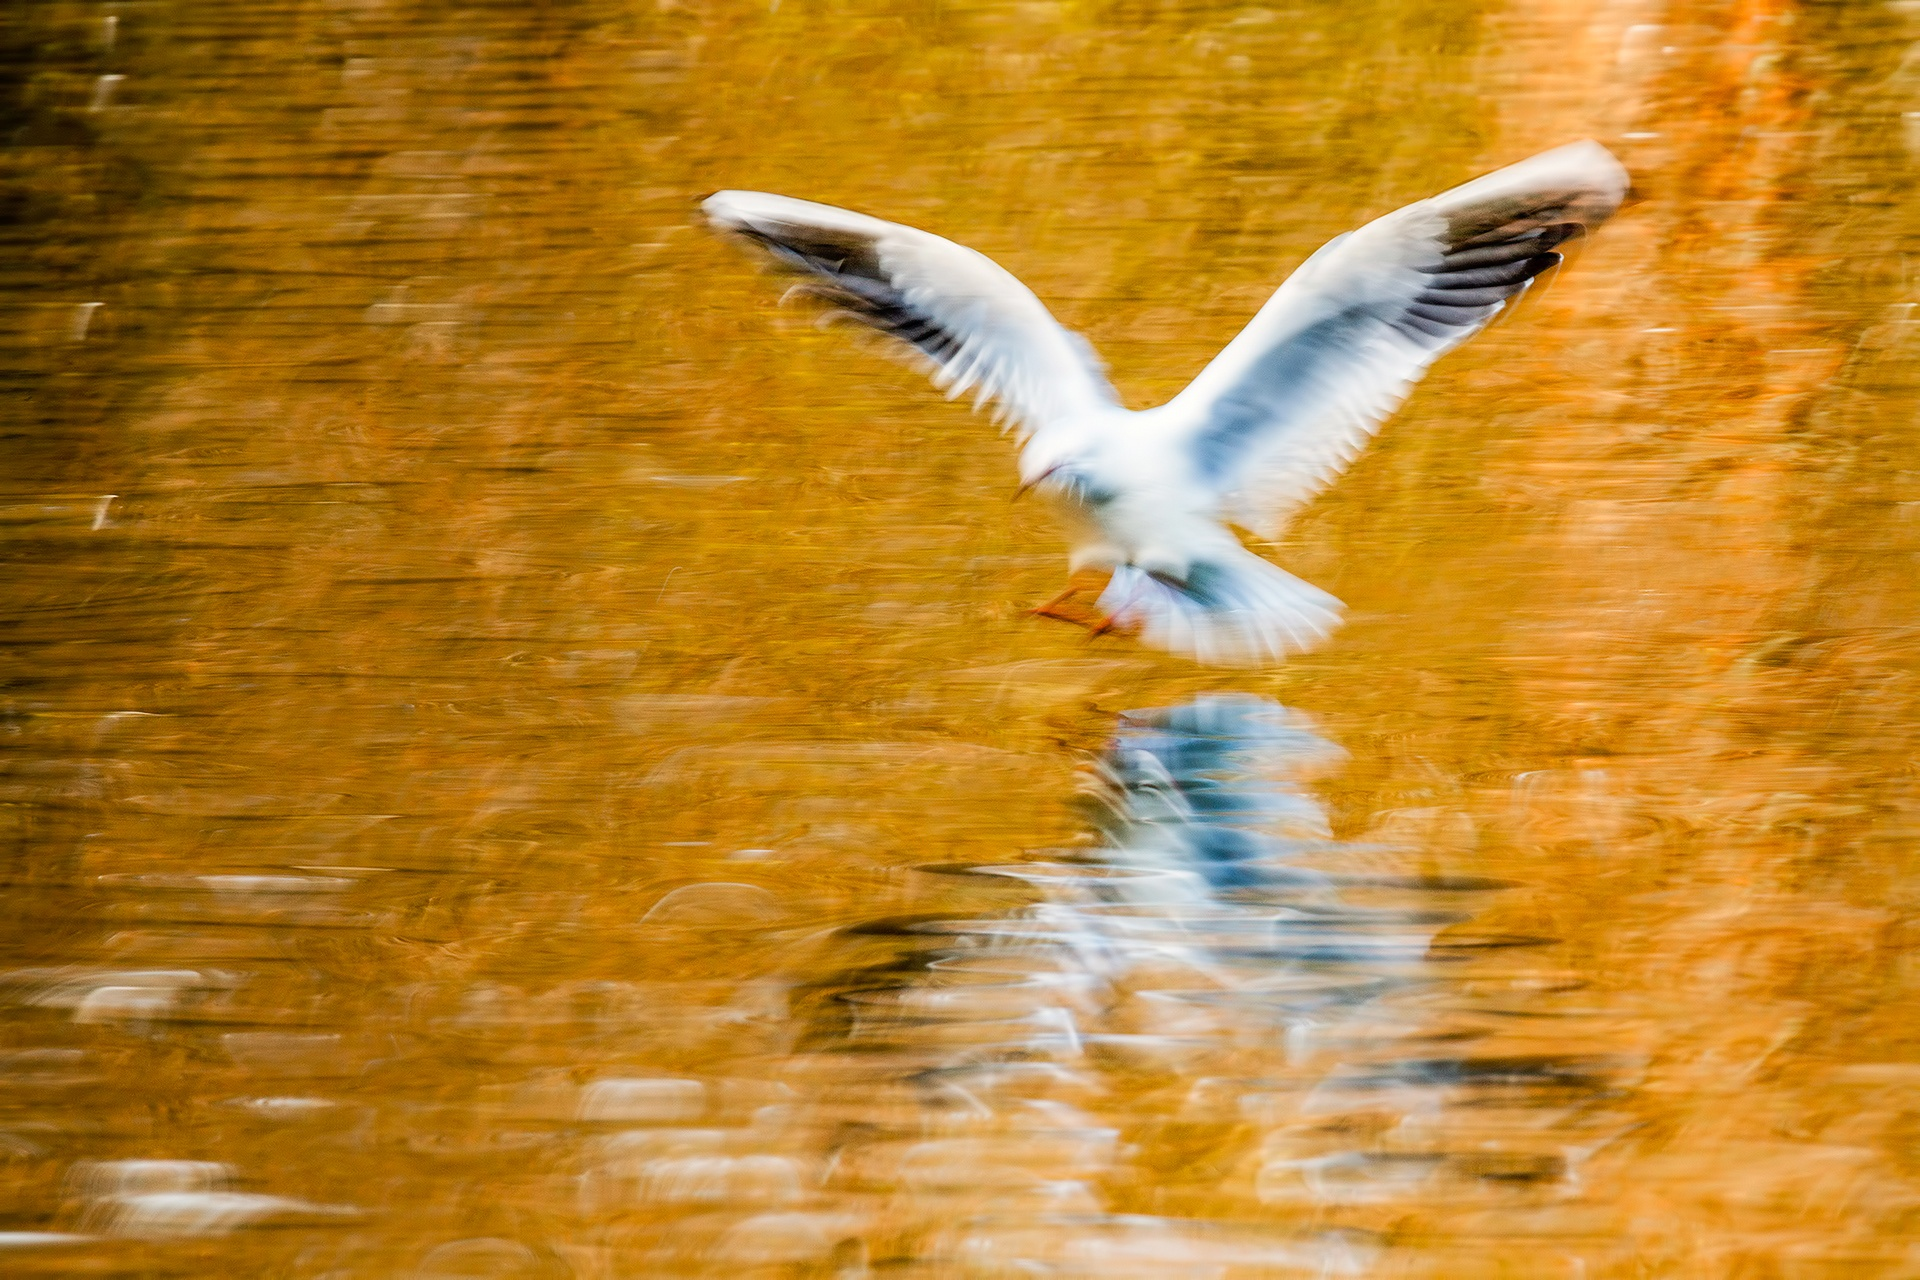 Water spirit - Mario Suarez - Portfolio Natural, Fotografía de Naturaleza de Autor